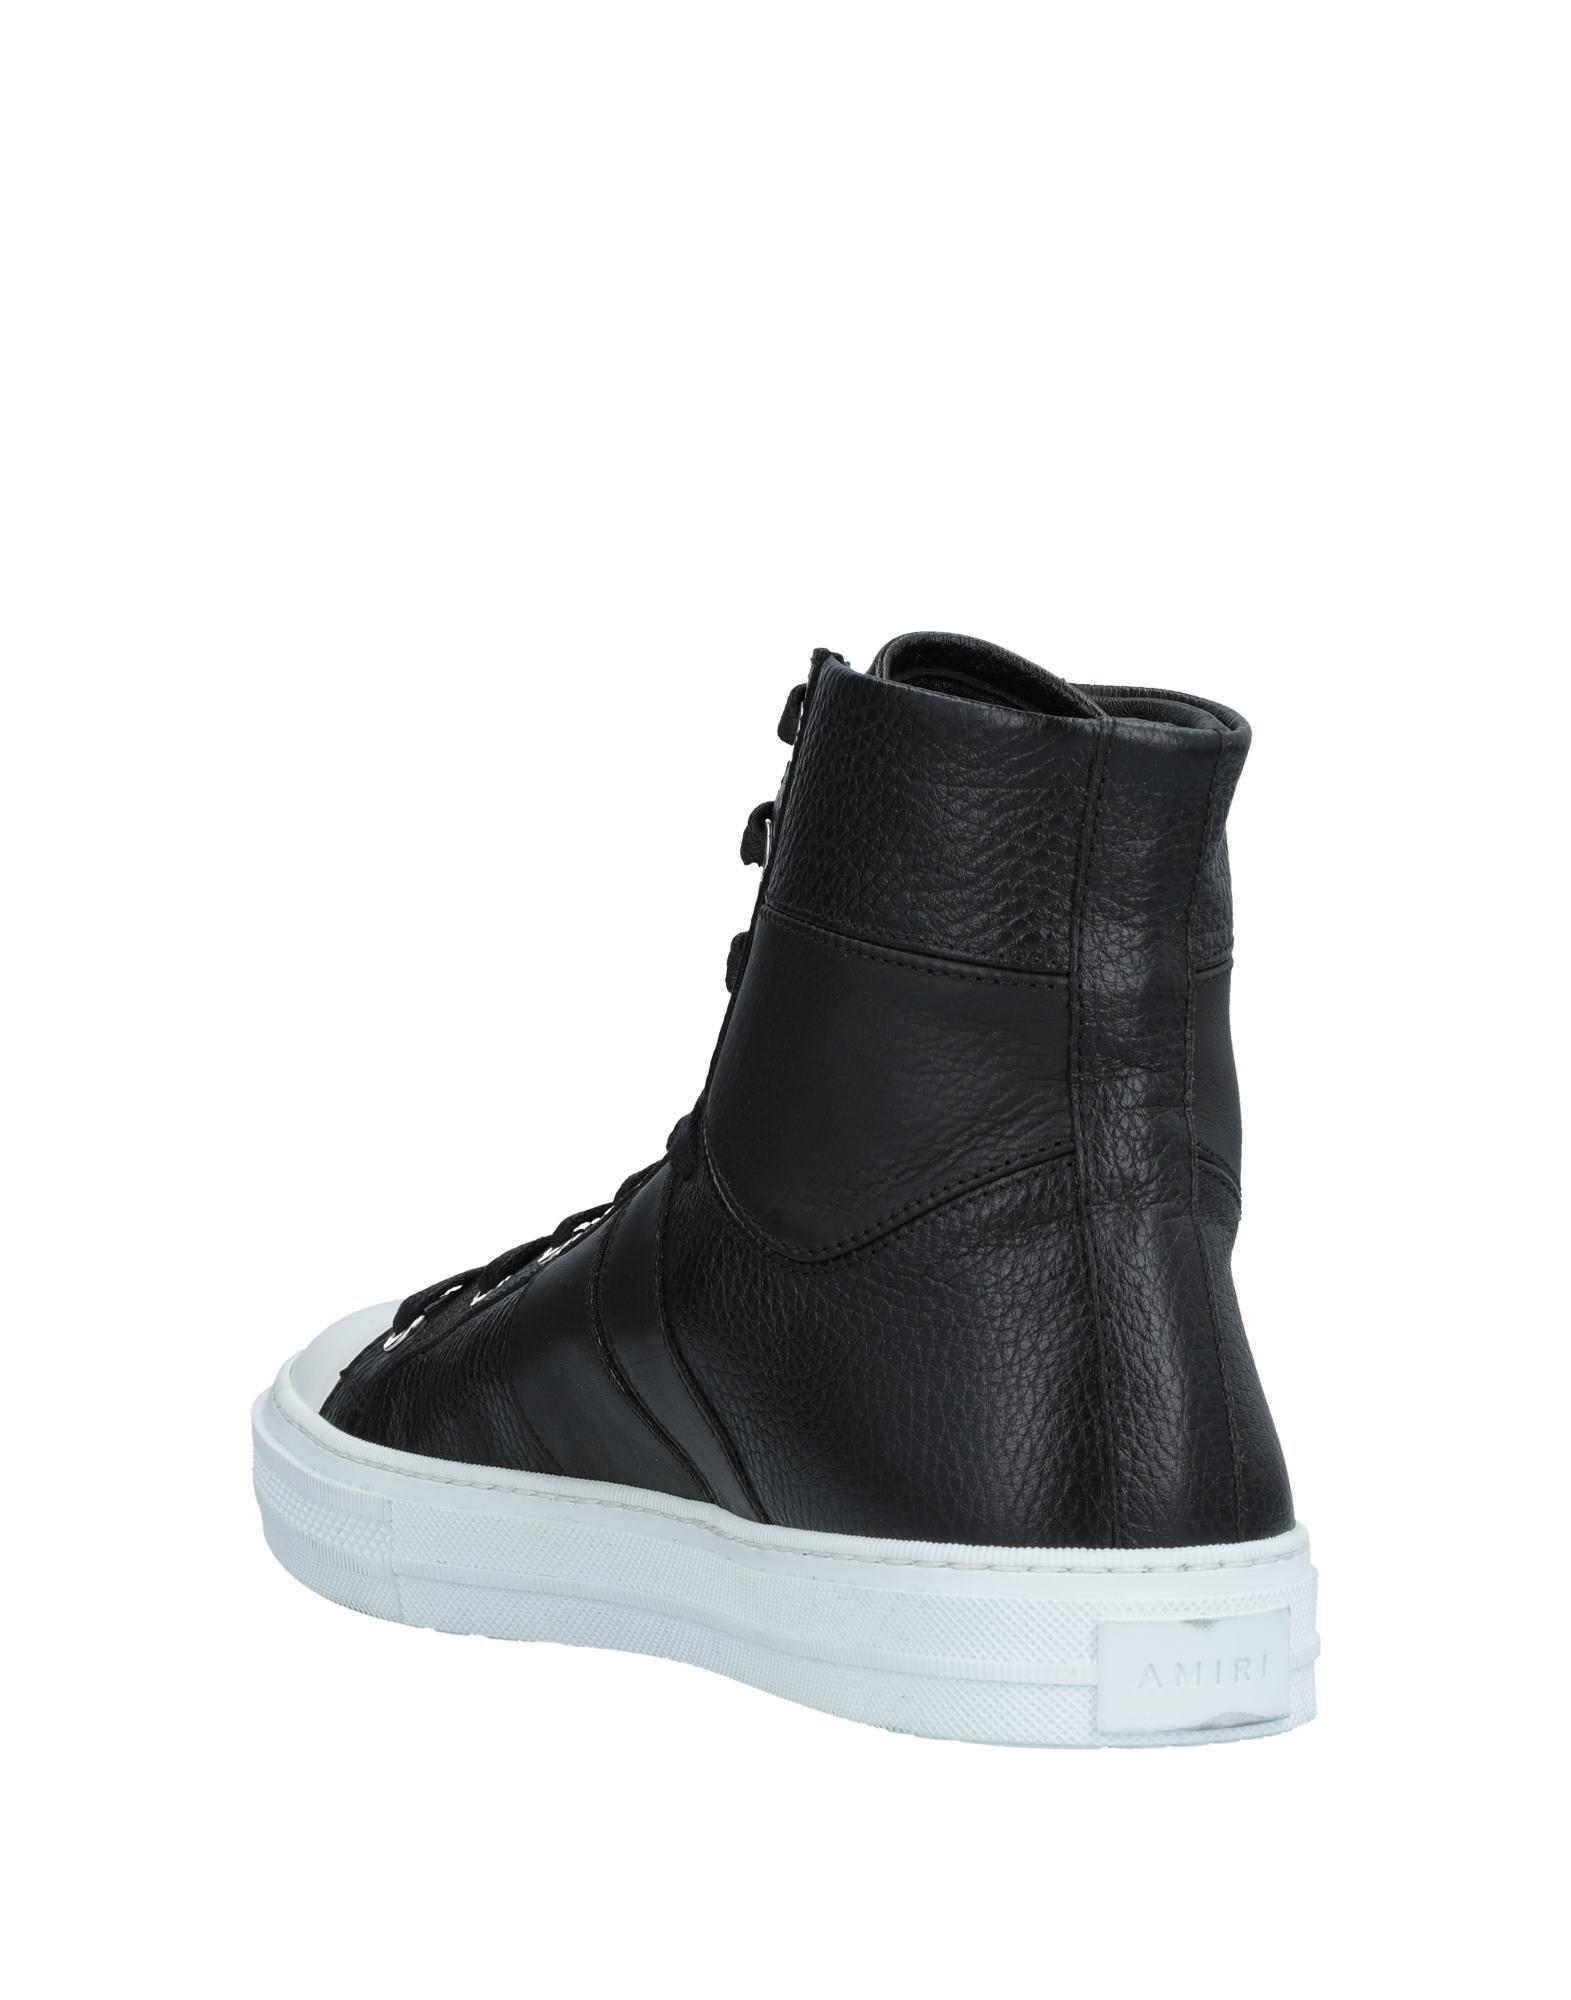 Amiri Sneakers Herren  11488698HN Gute Qualität beliebte Schuhe